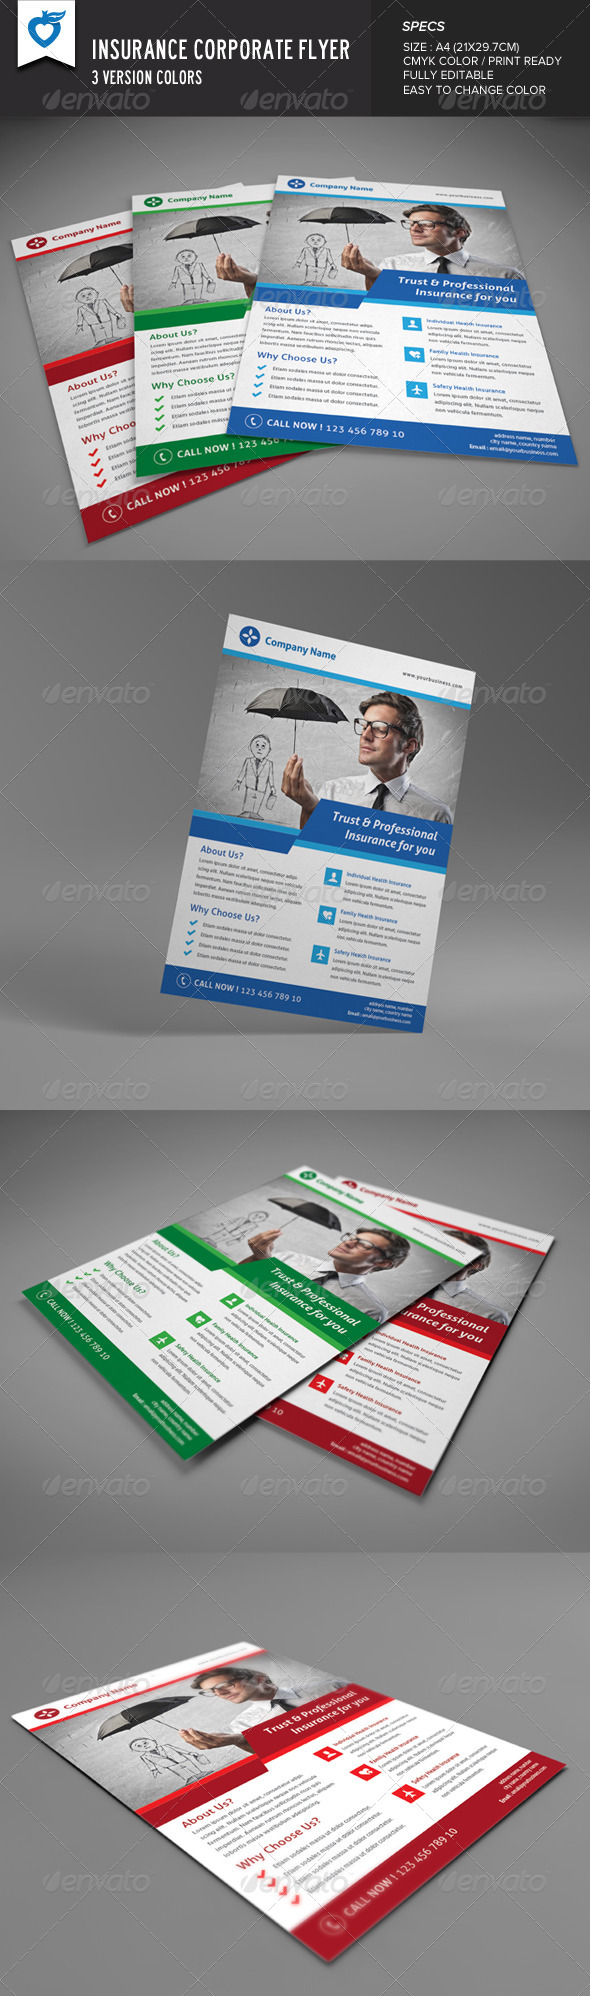 GraphicRiver Insurance Corporate Flyer 8625013